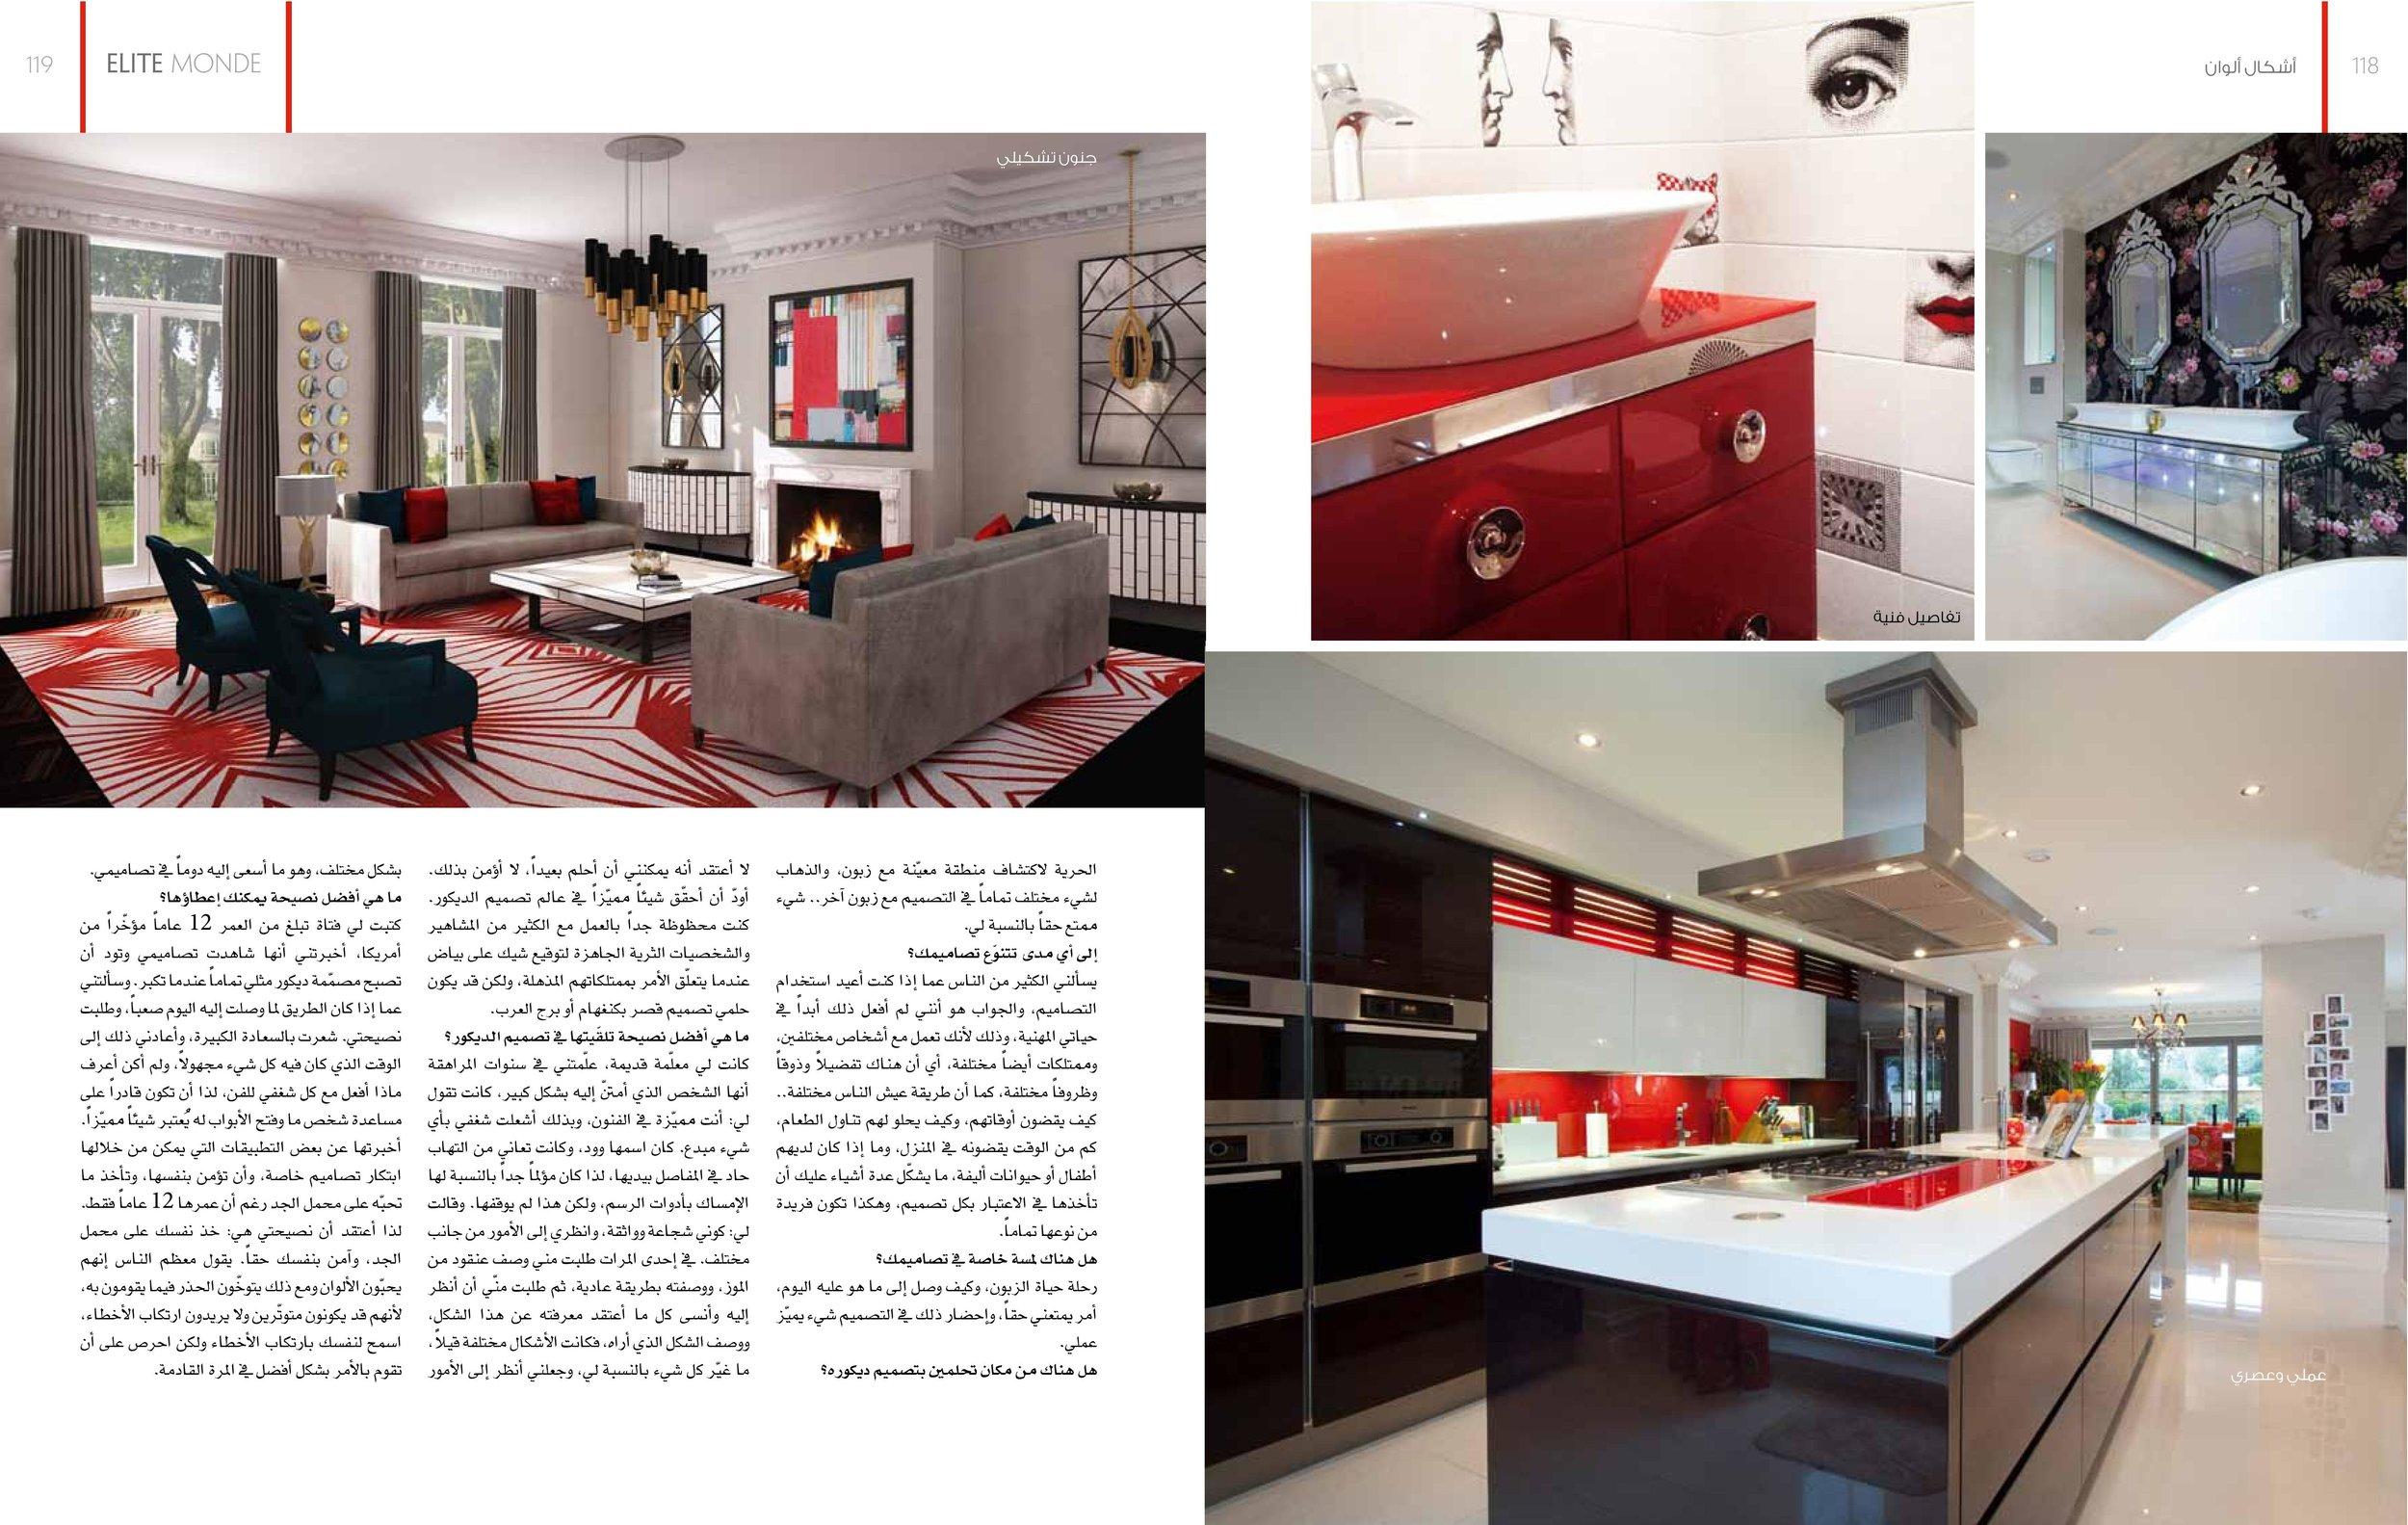 High-end London interior designer Jo Hamilton Elite Monde pages six and seven